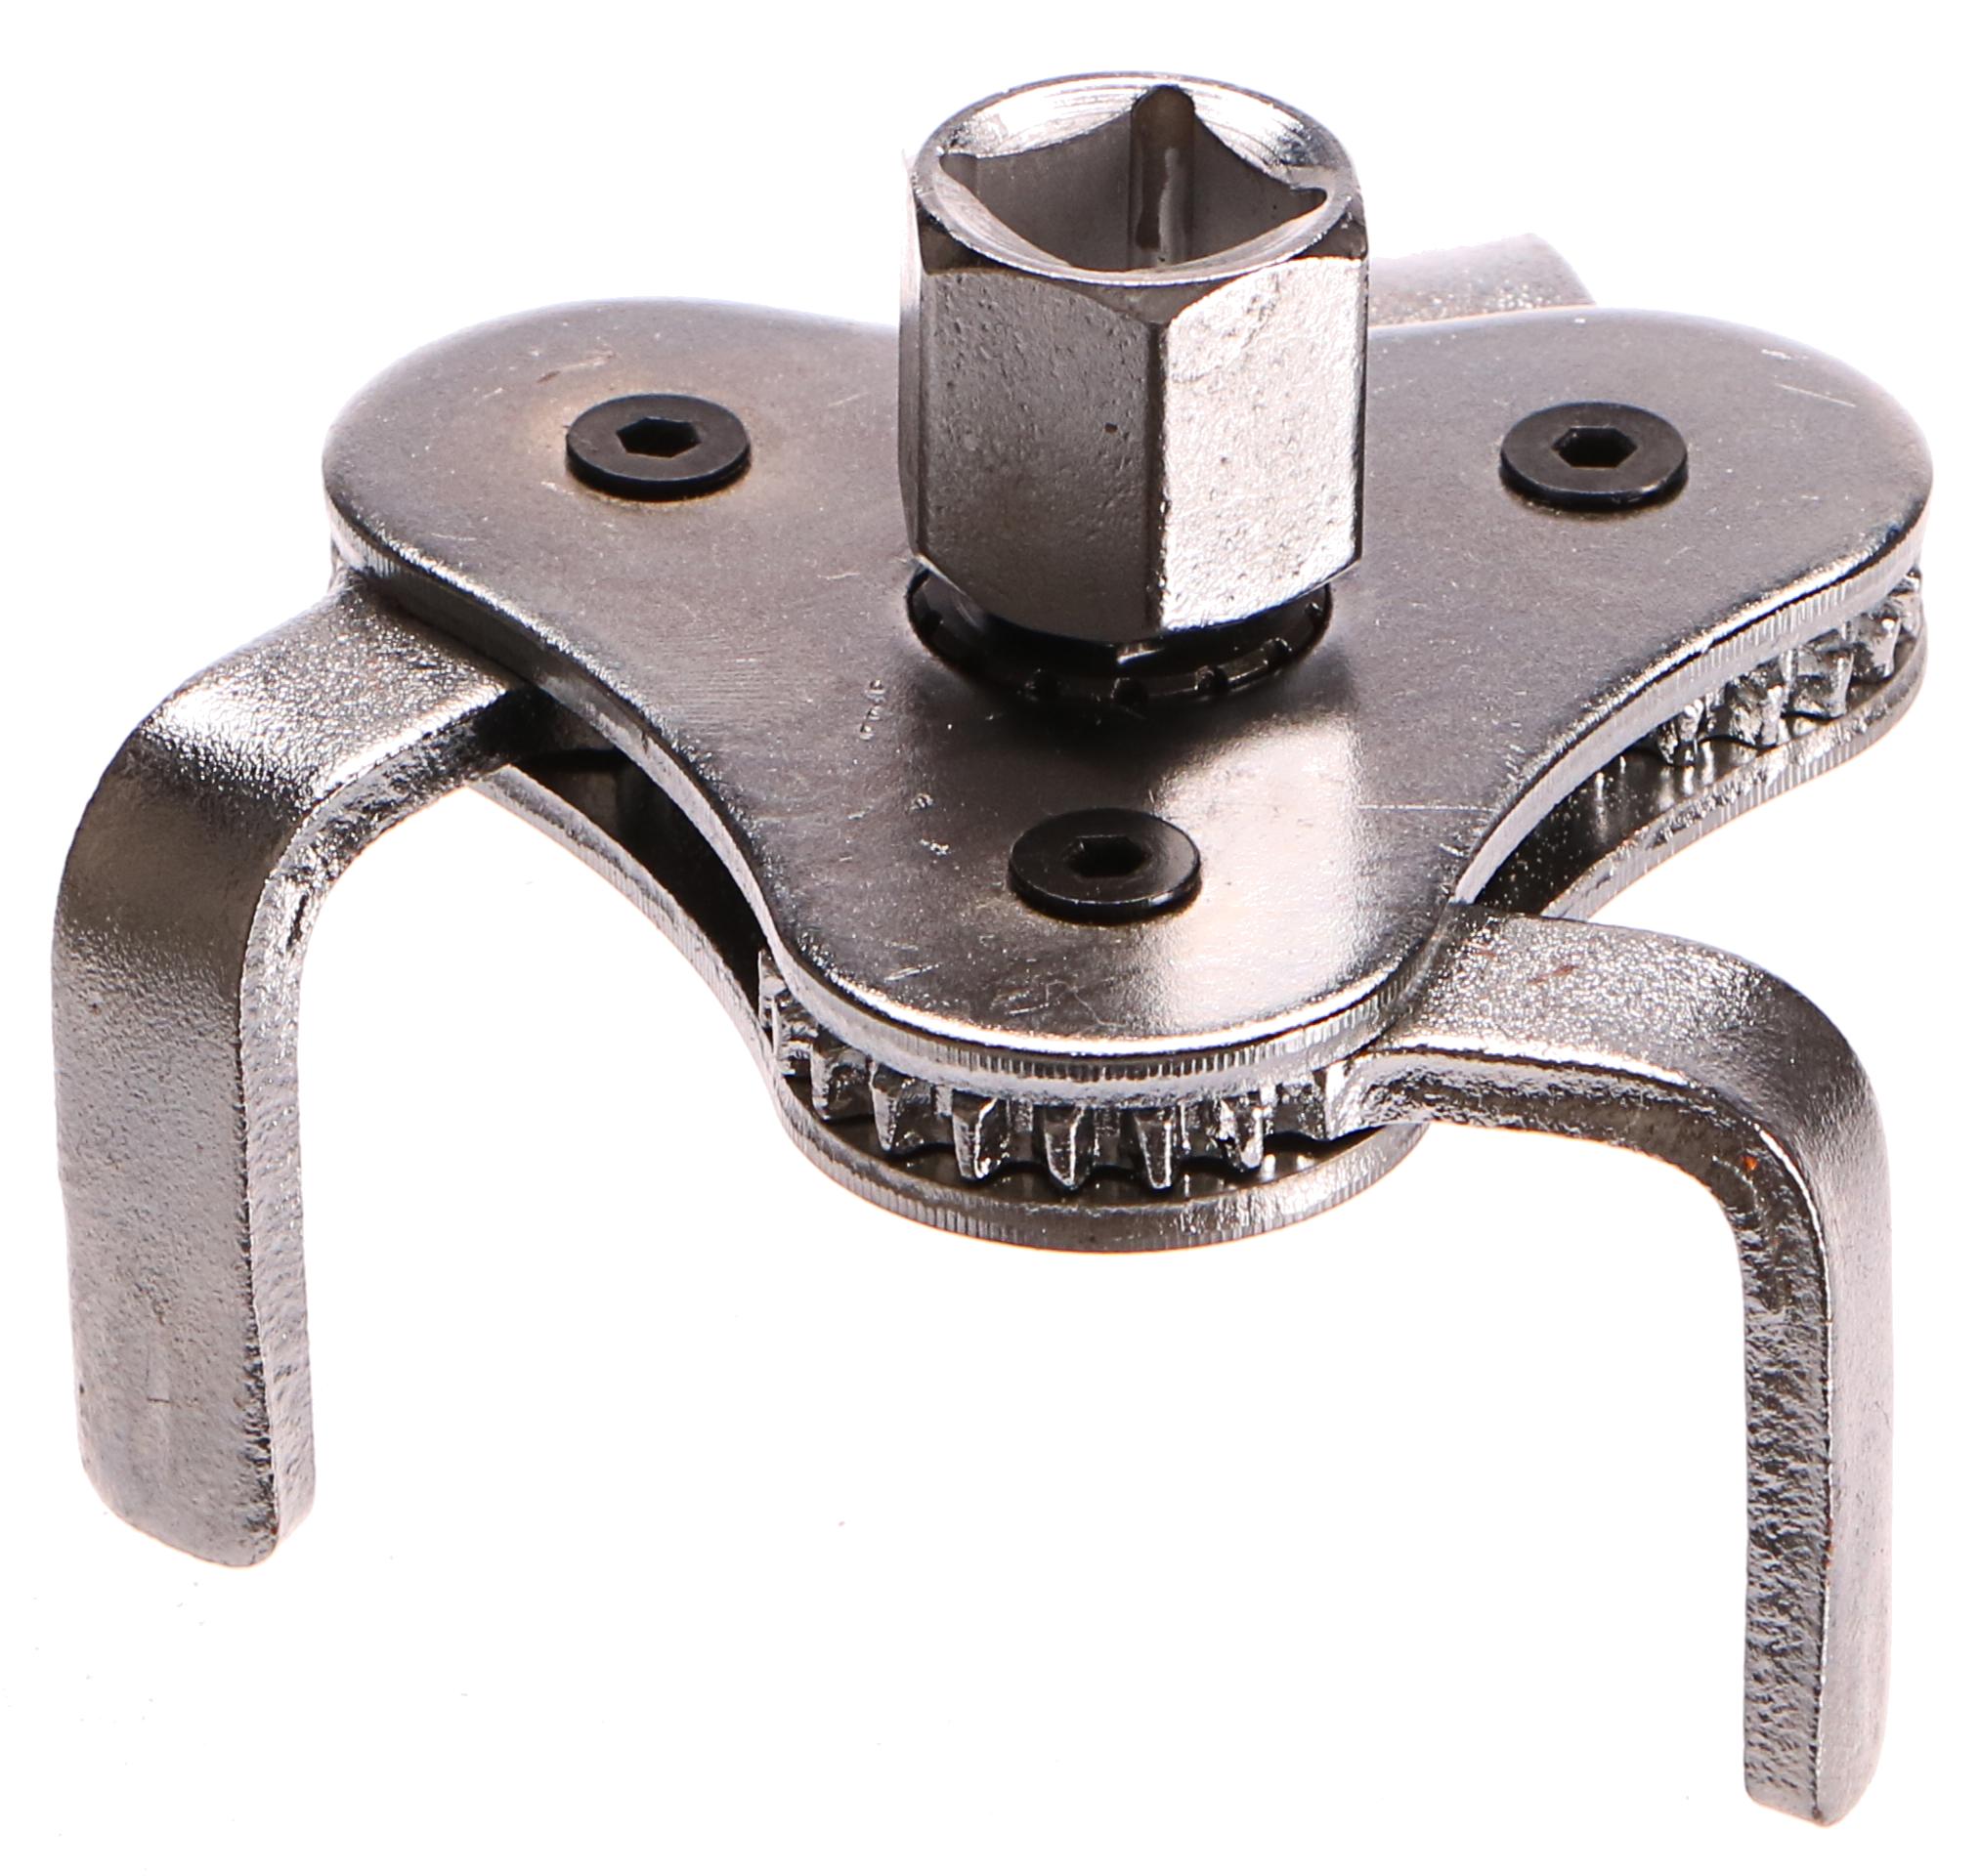 "Klíč na olejový filtr 1/2"" (62-120mm), GEKO"